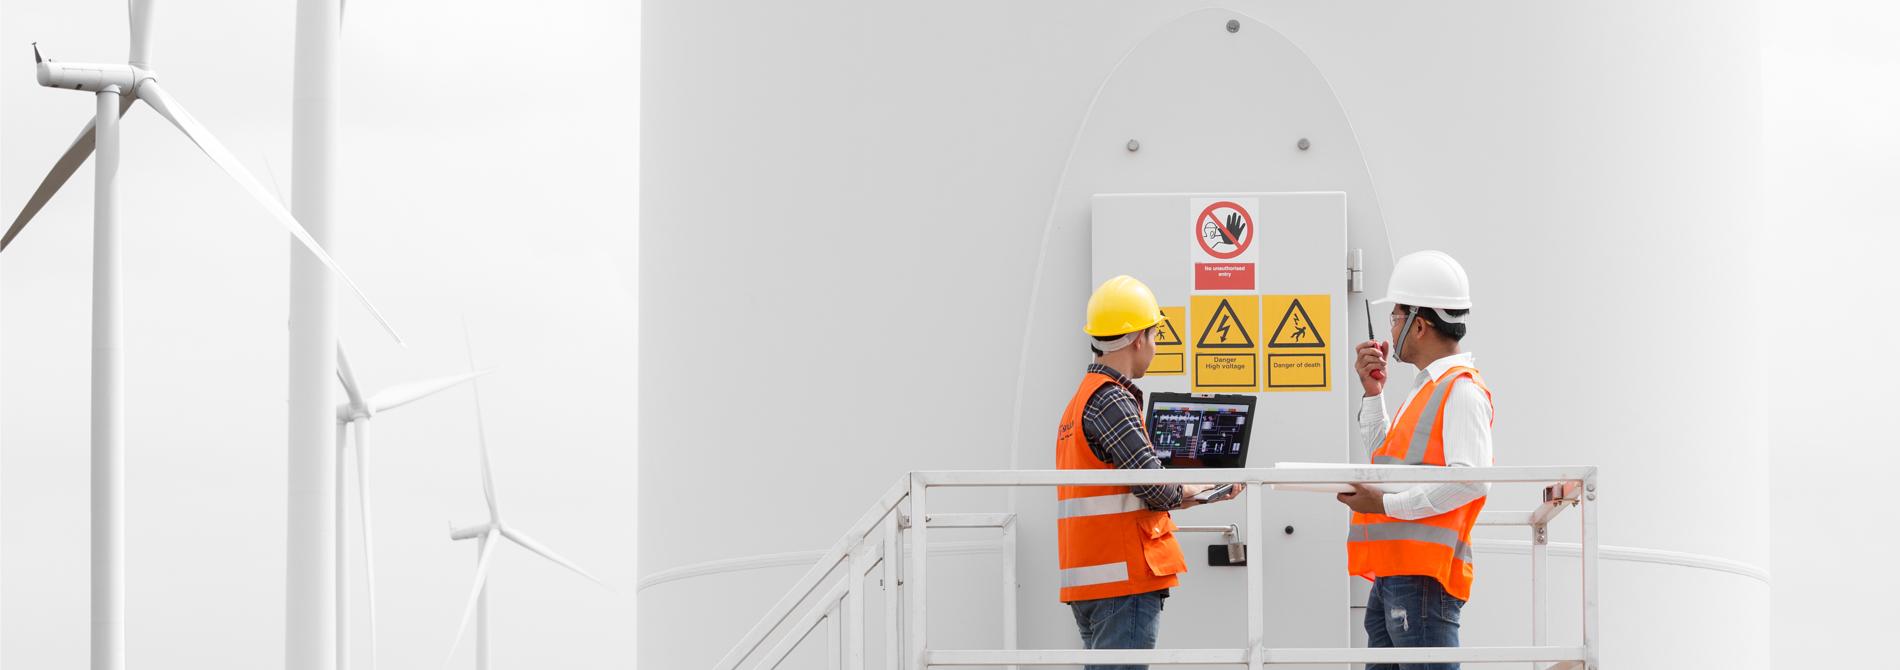 WTSR Authorising Engineer Module